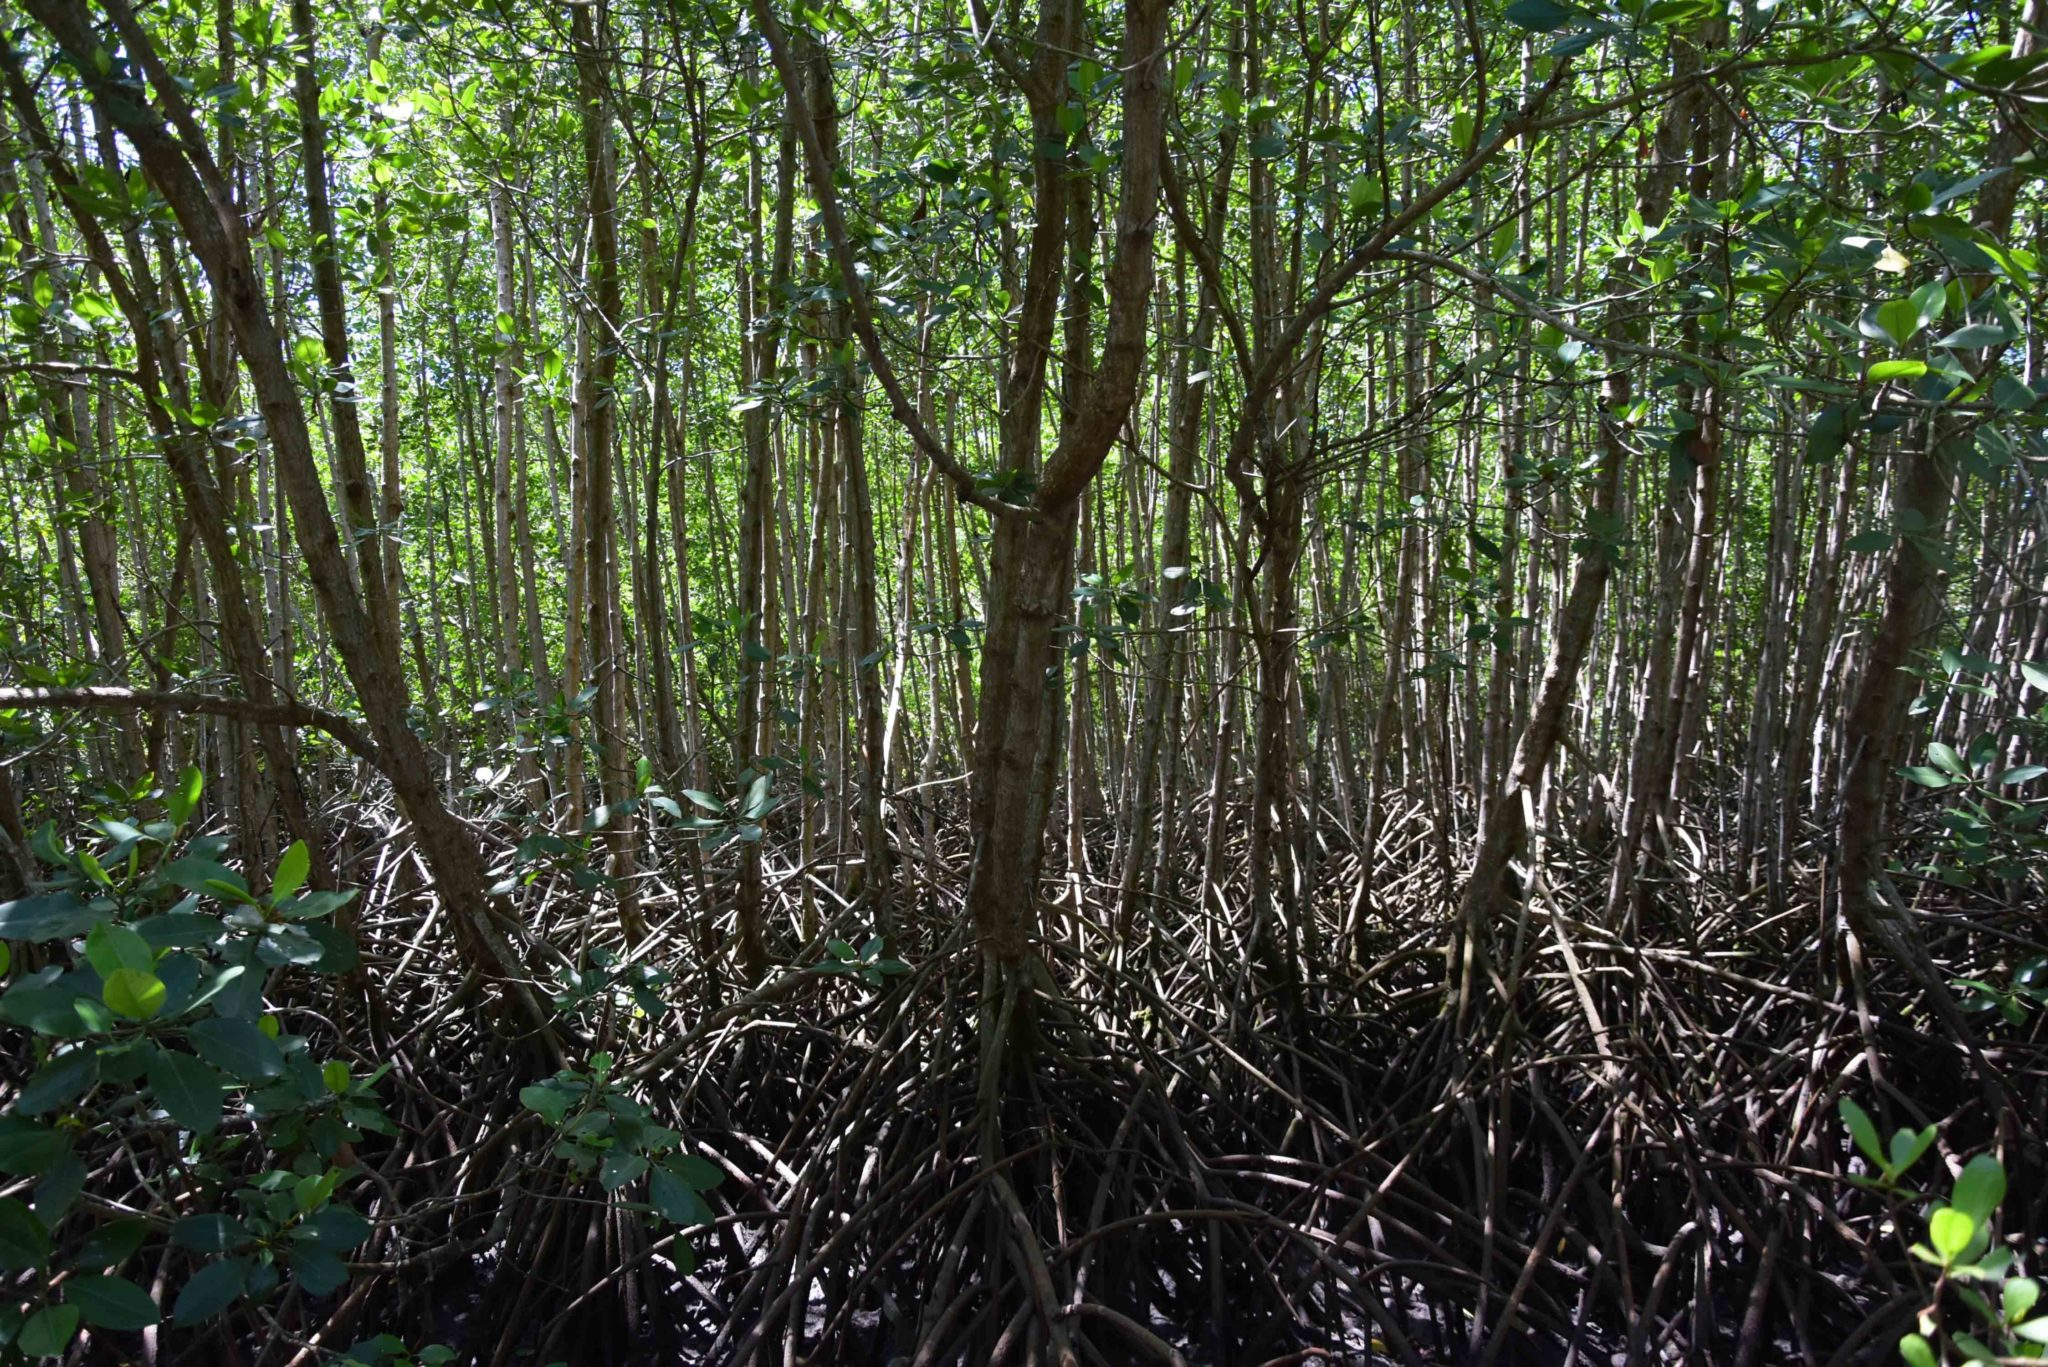 bali mangrove forest